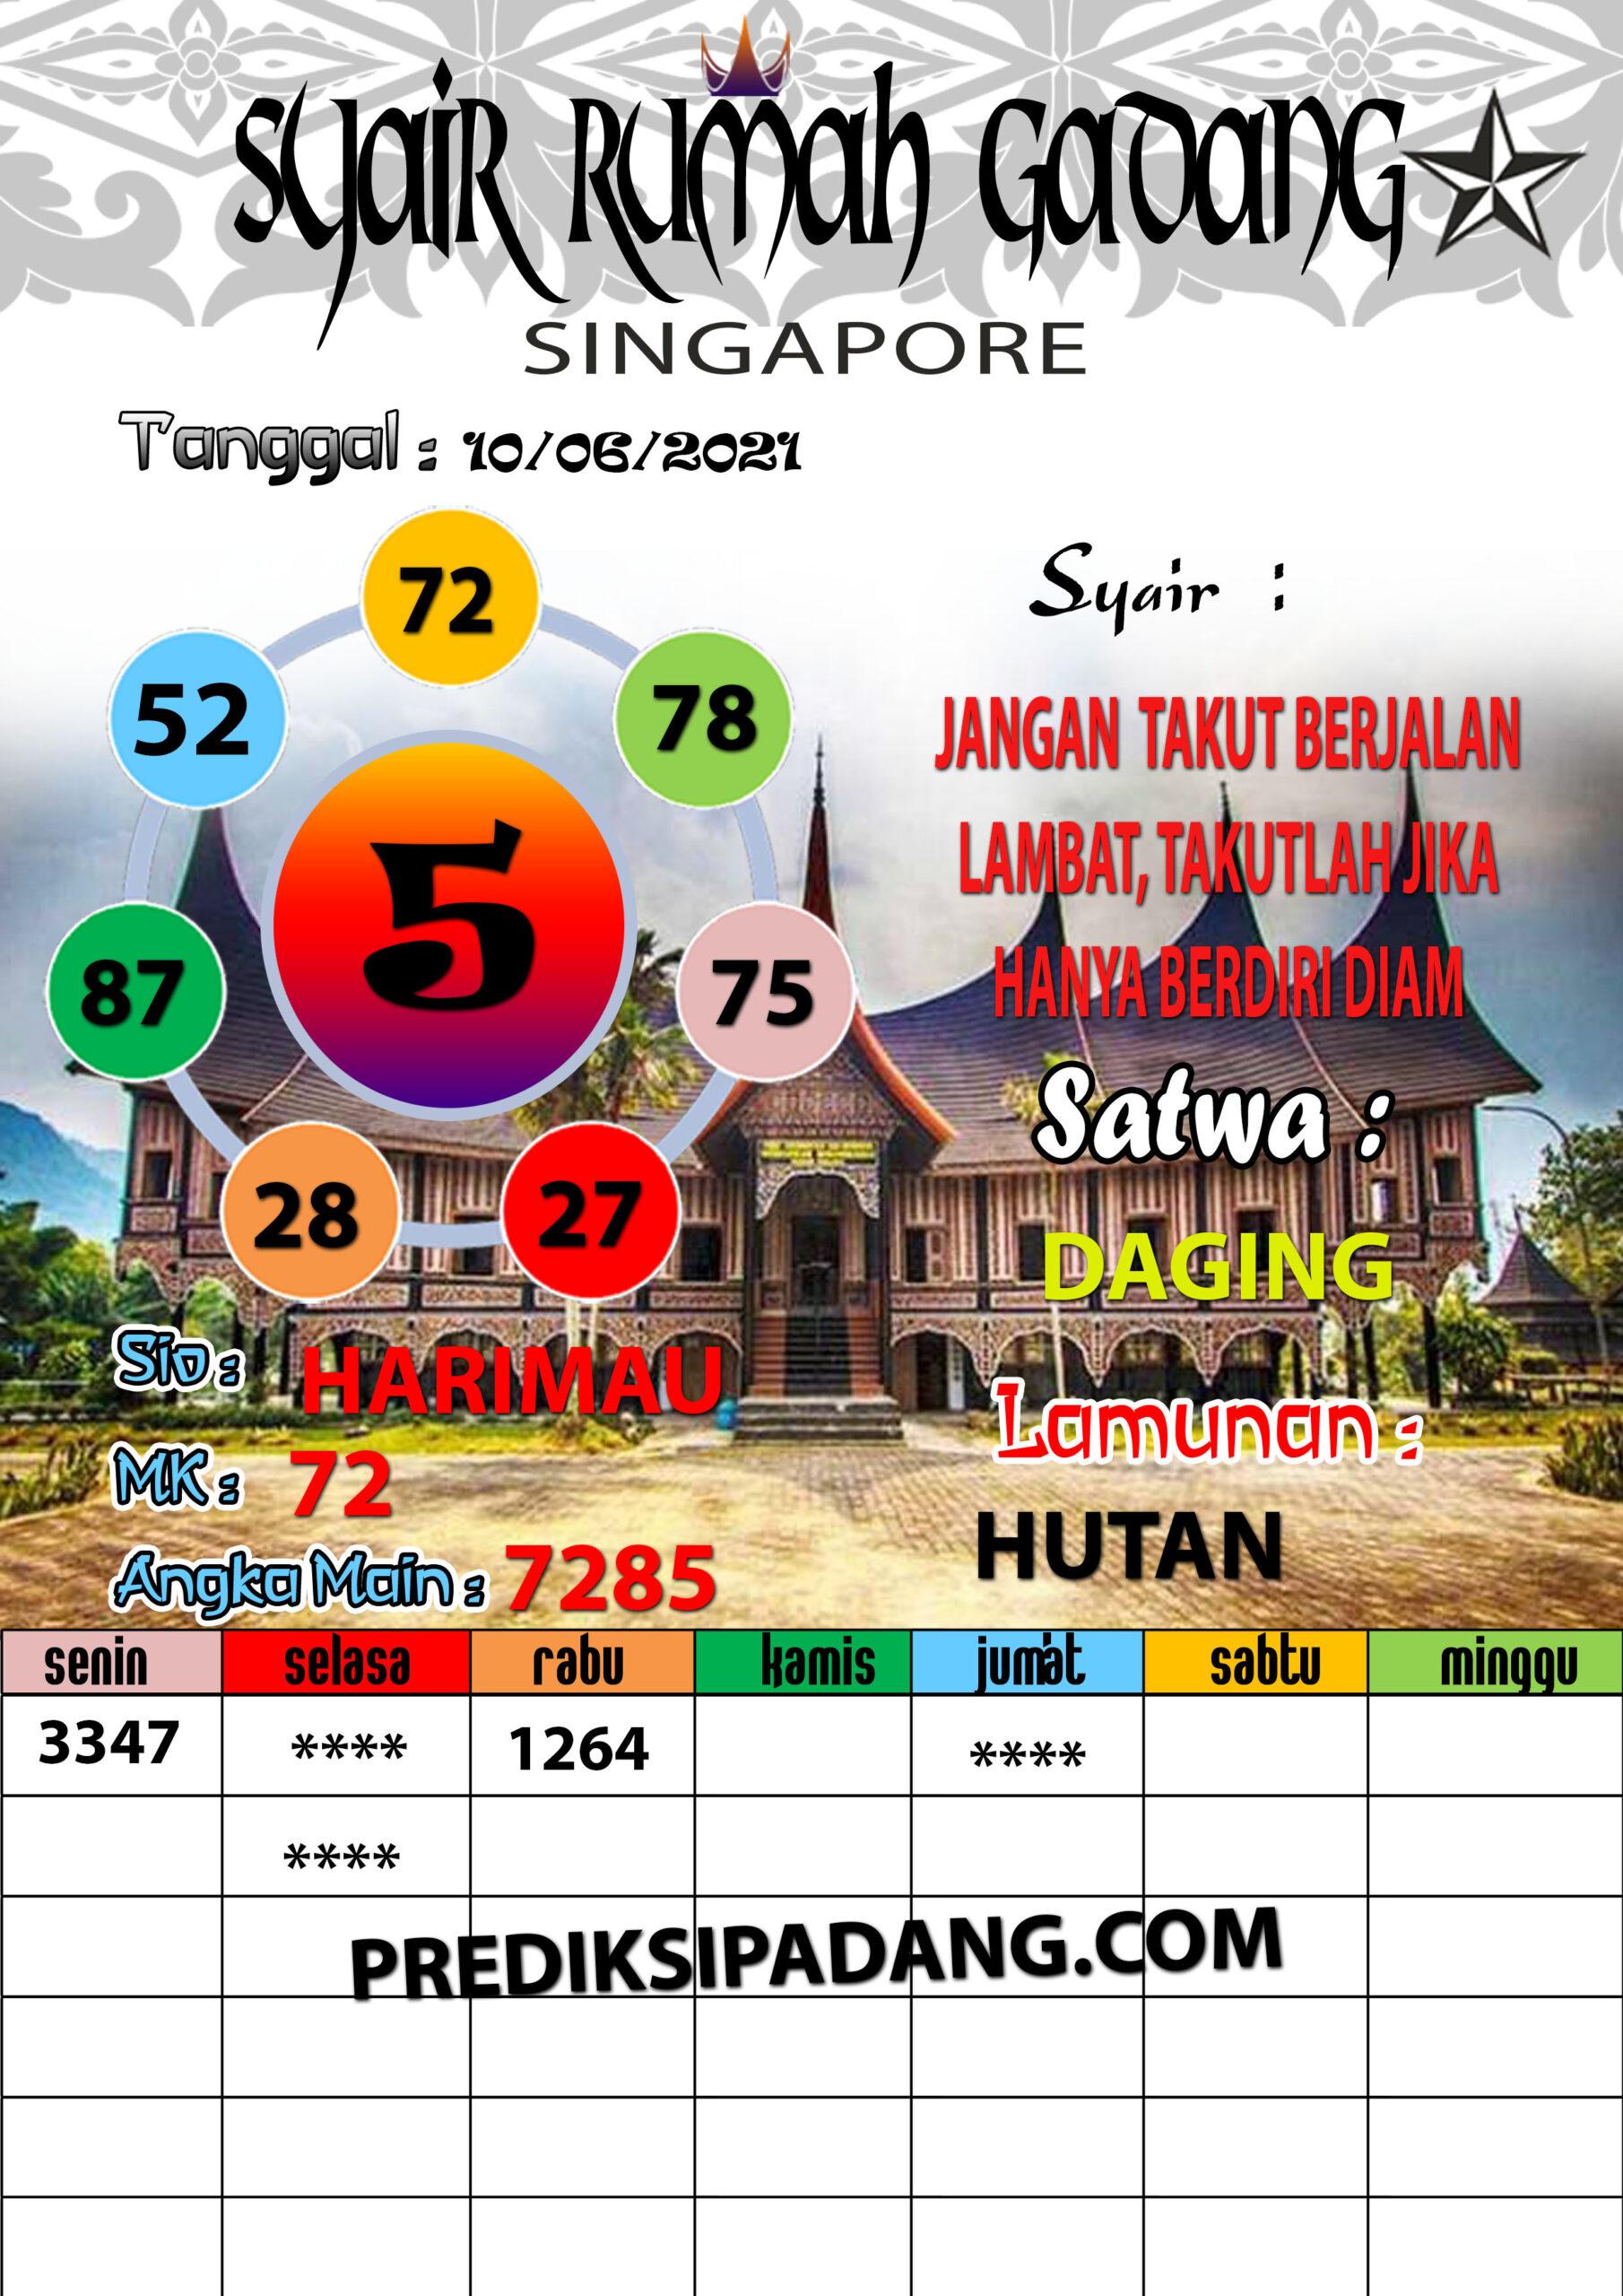 SYAIR SGP HARI INI 14 Oct 2021